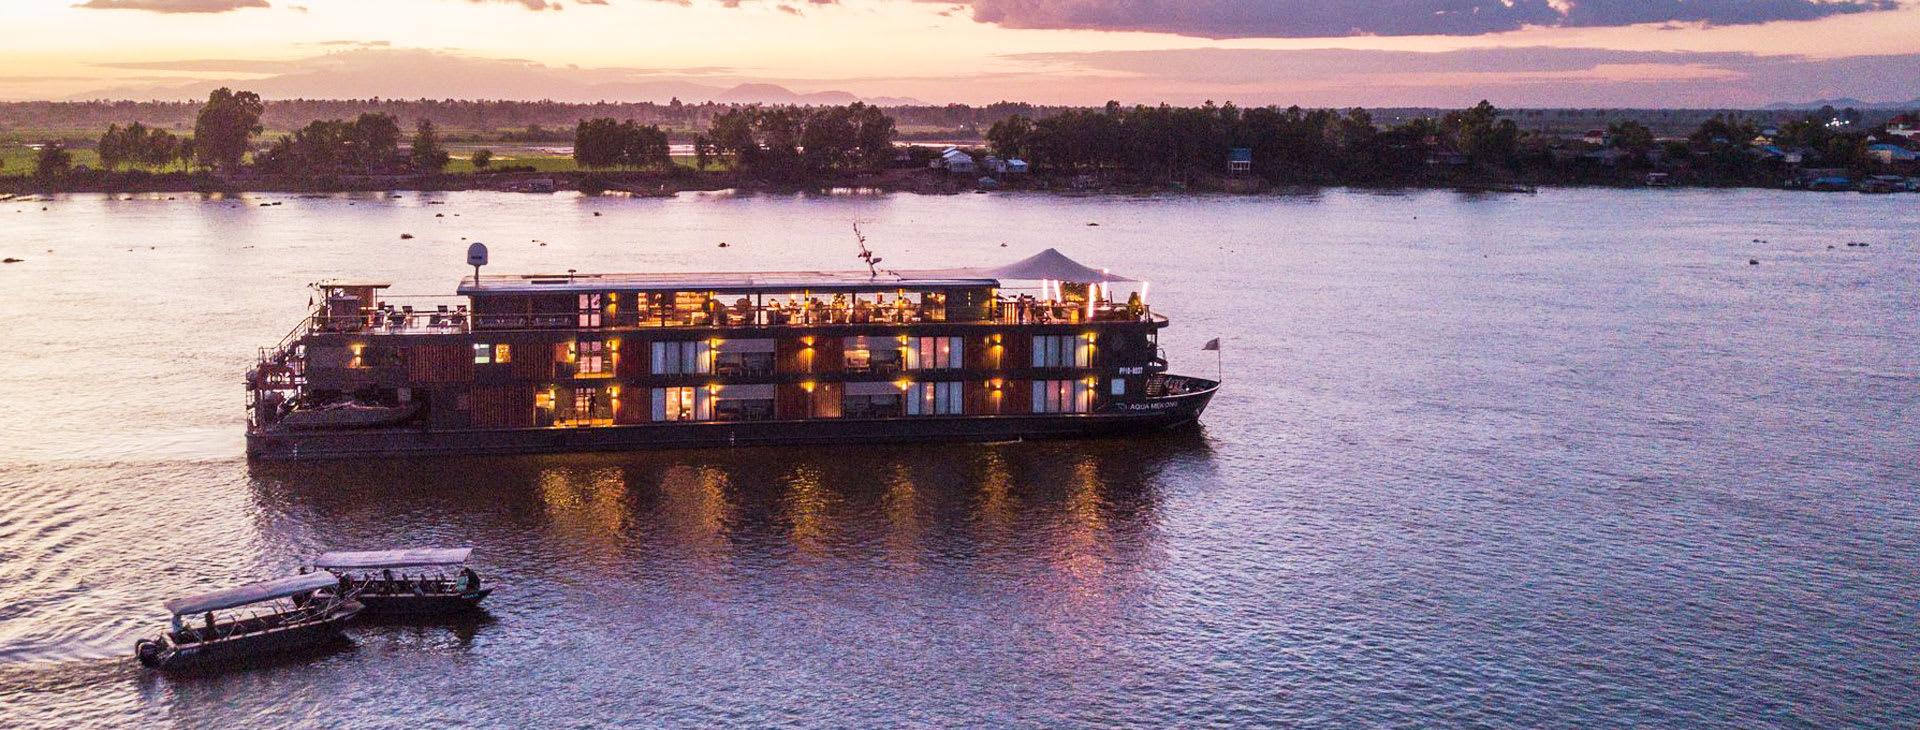 Aqua Mekong aerial view during sunset